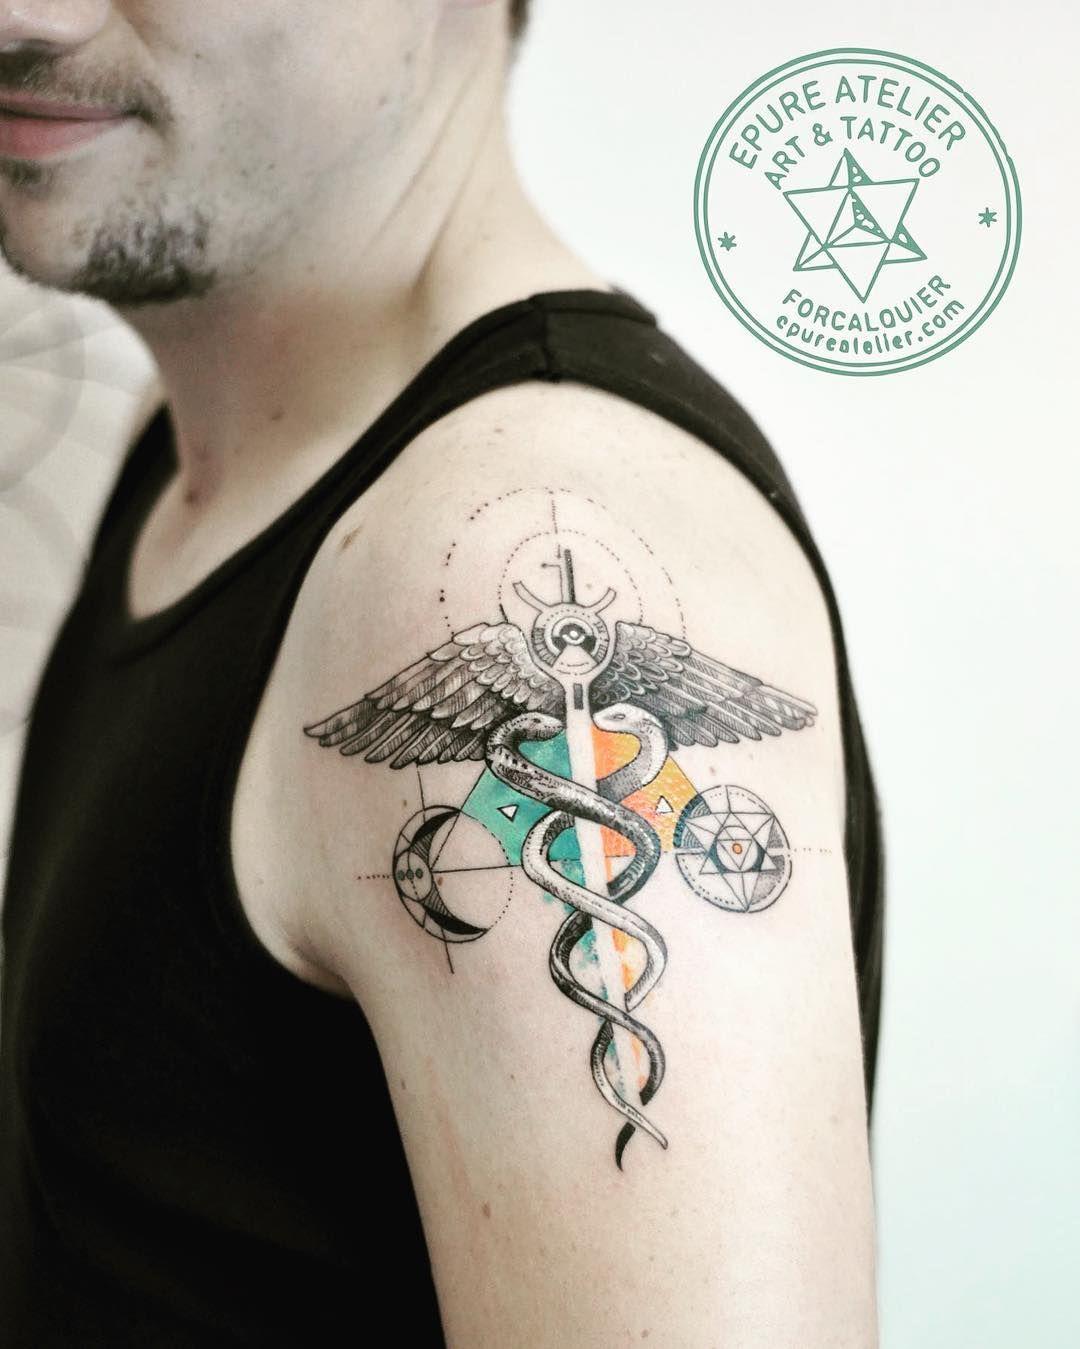 Tattoos tattoo ideas on pinterest rn - 15 Ink Designs For Nurse Tattoos Nursebuff